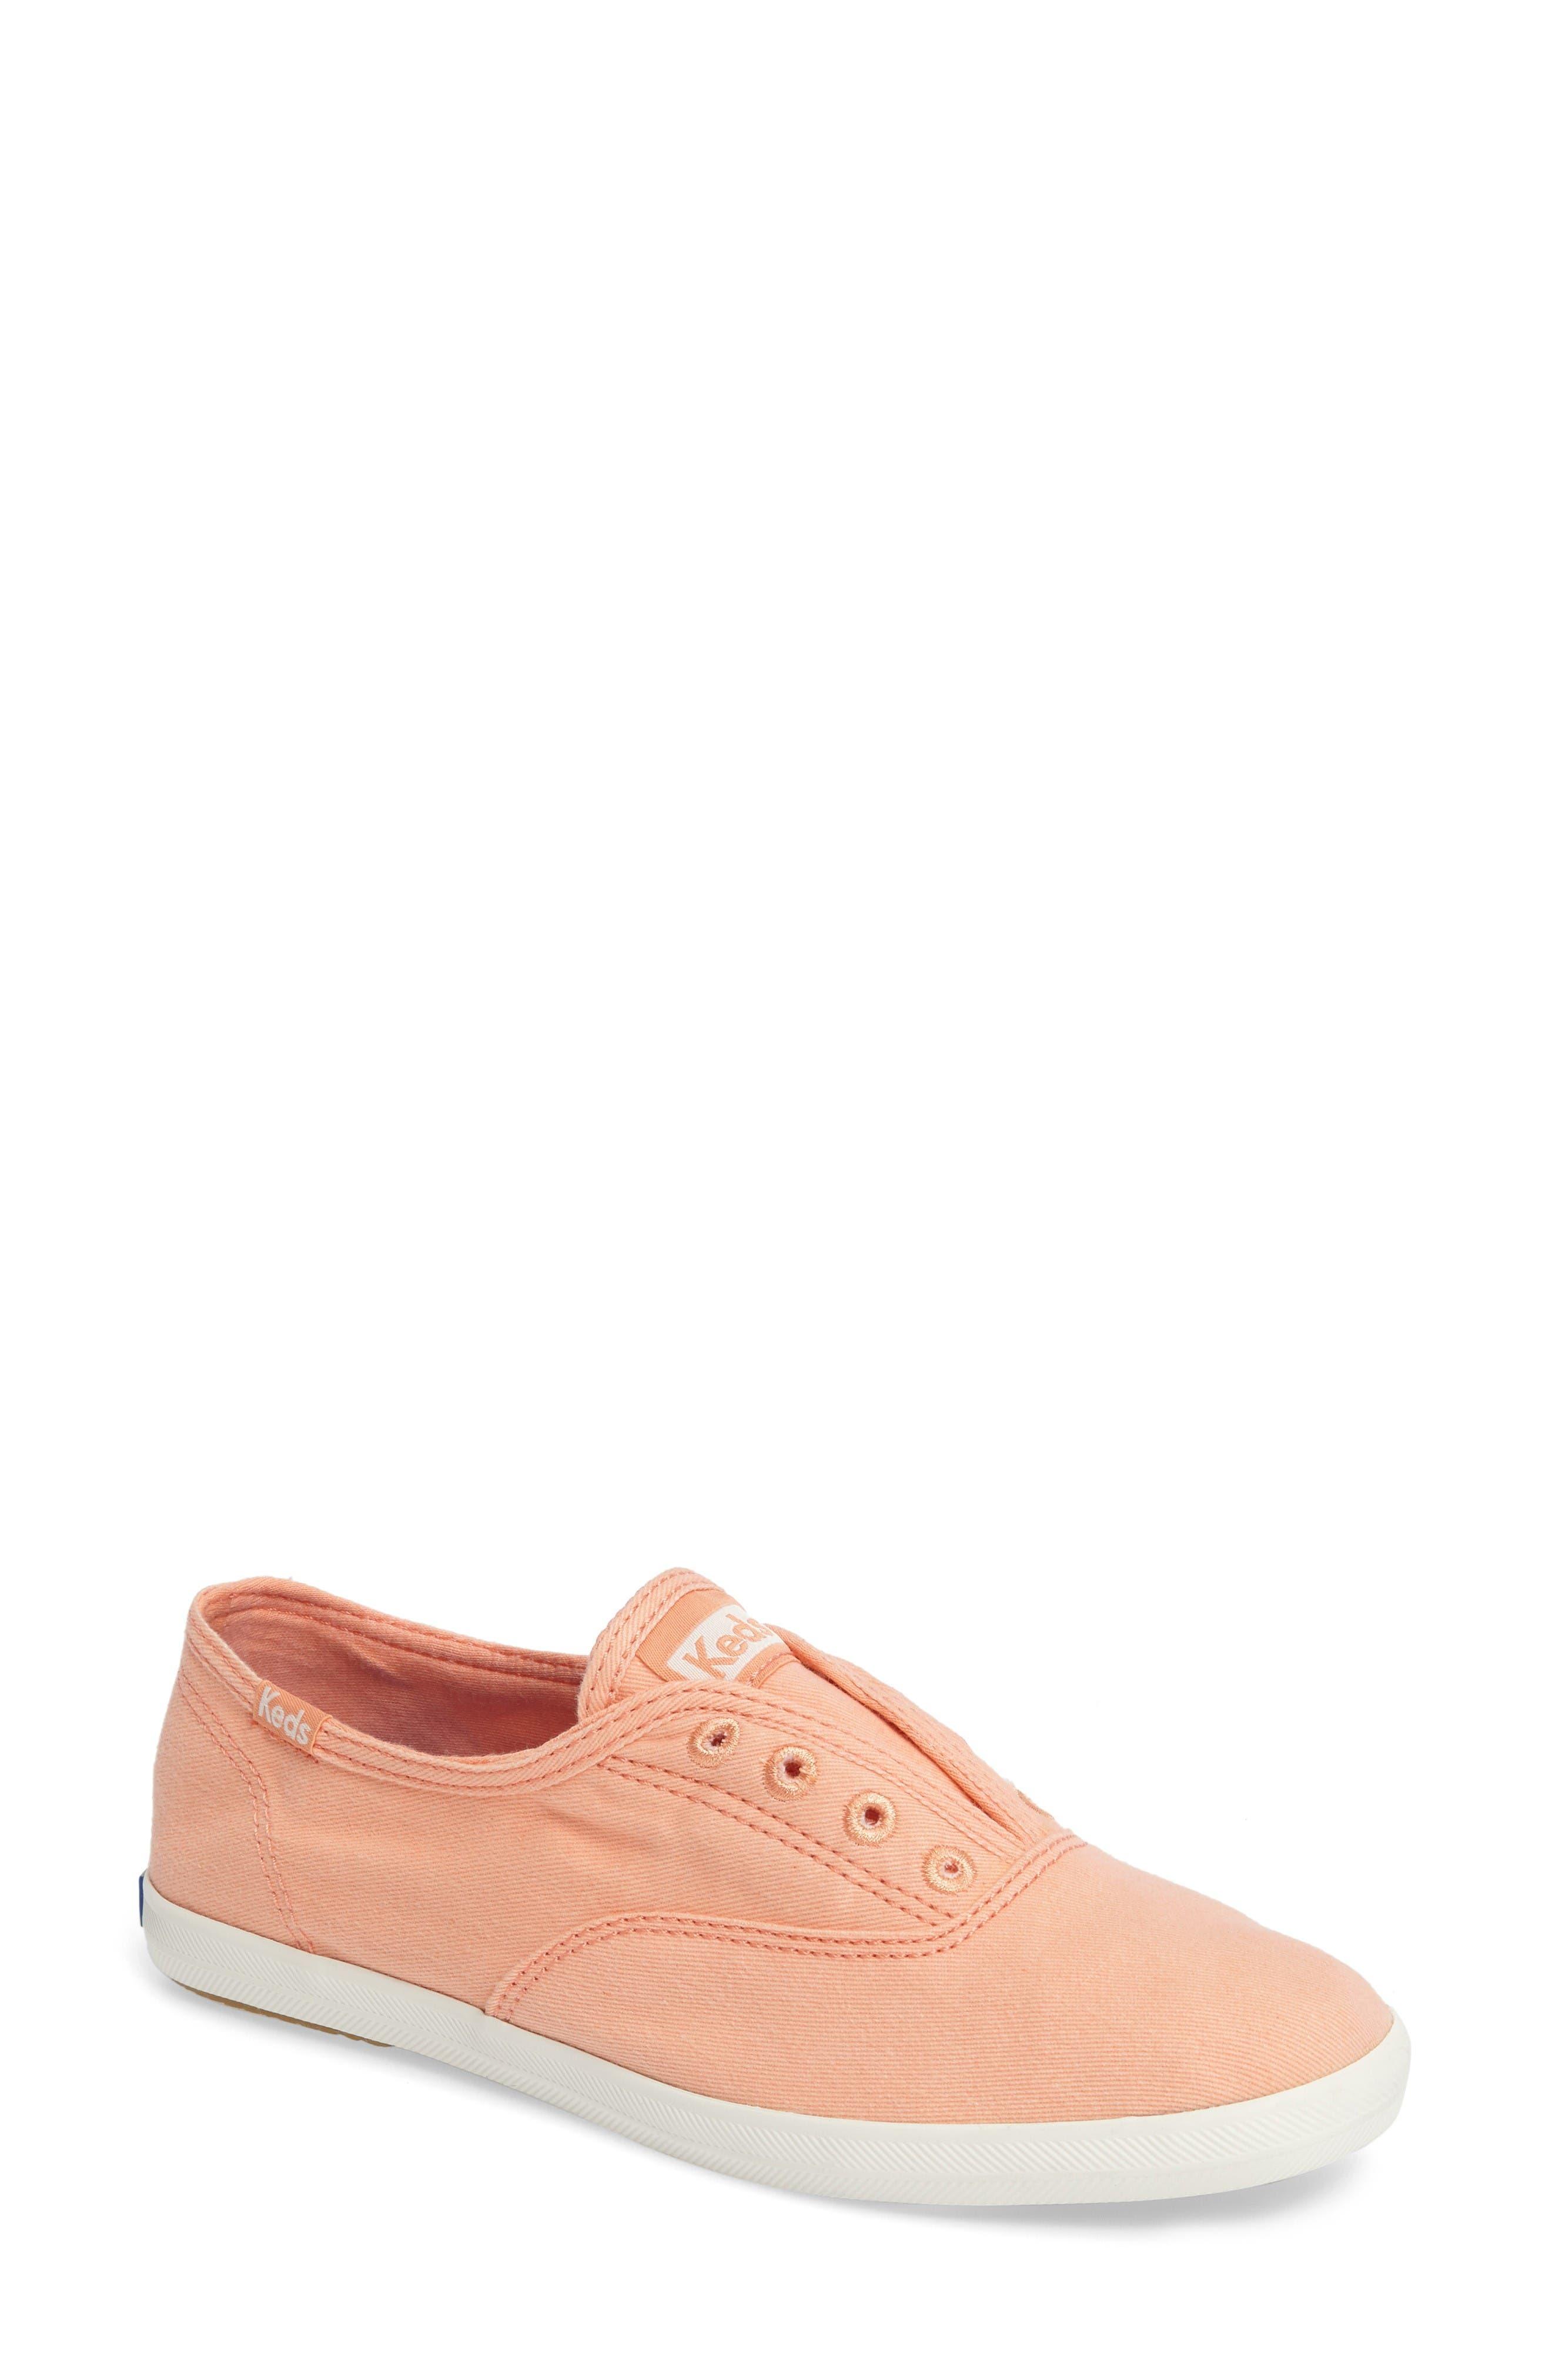 Main Image - Keds® 'Chillax' Ripstop Slip-On Sneaker (Women)